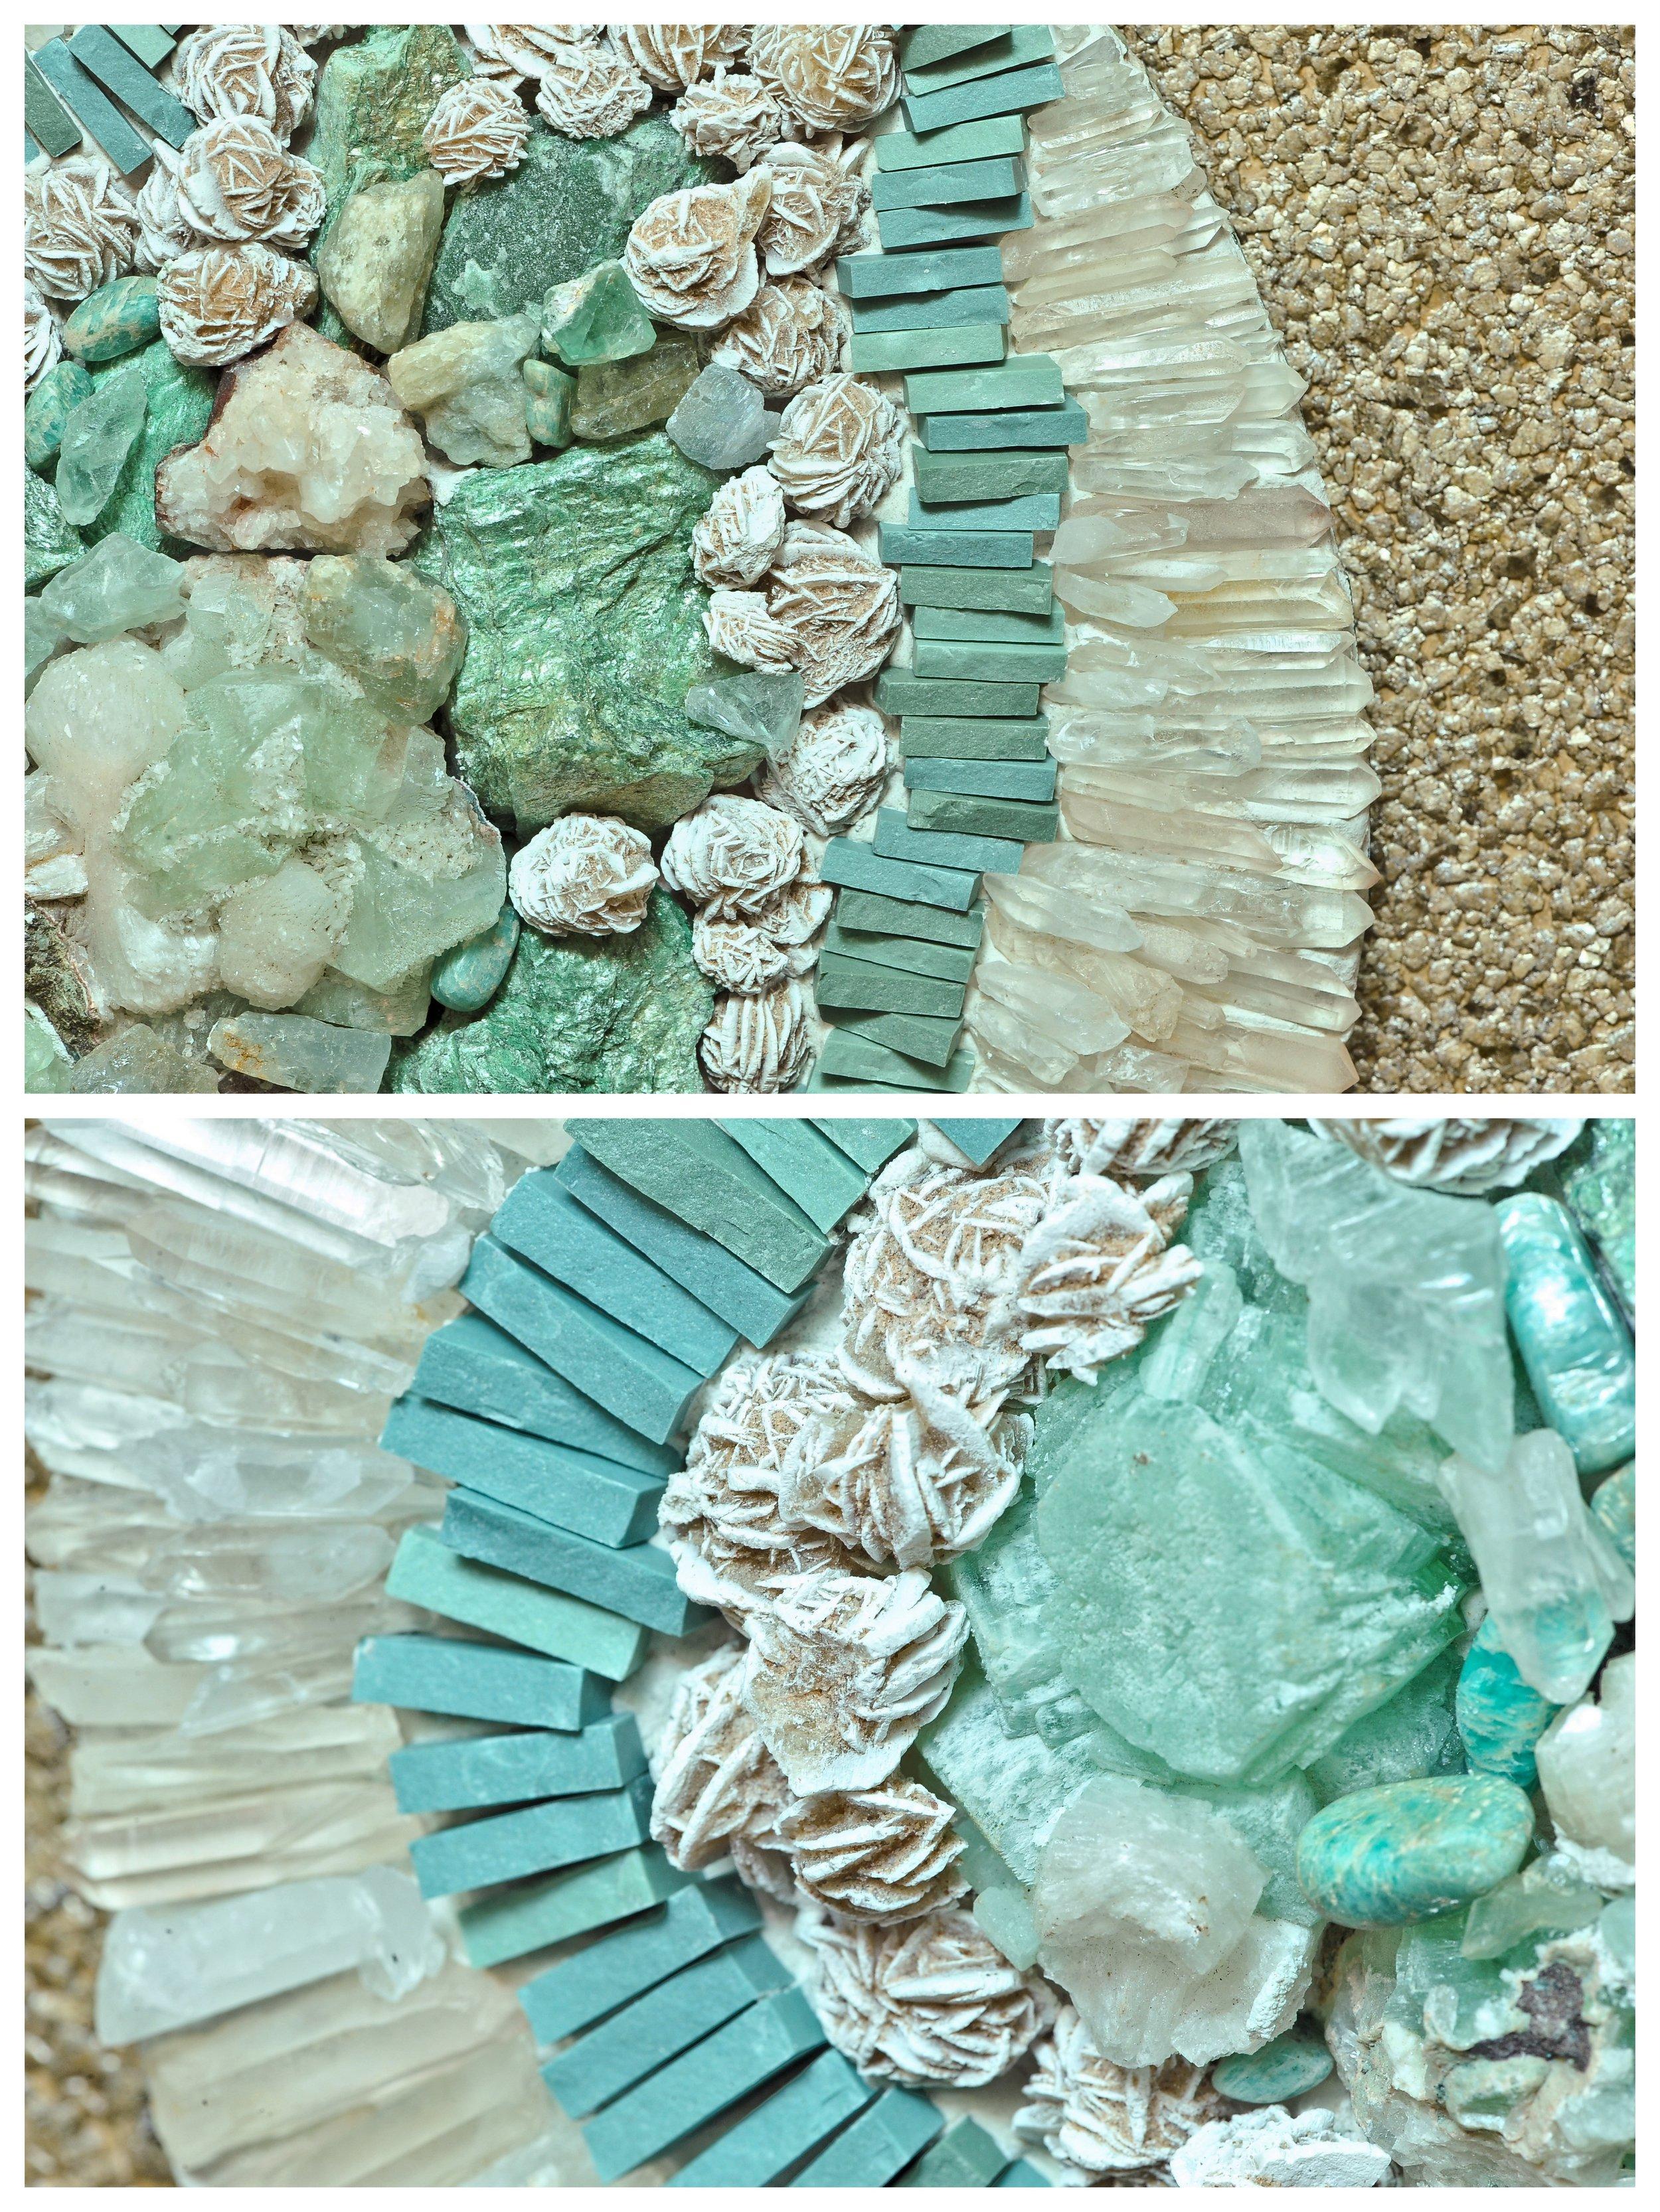 Aqua Mineral Powder Room connie broom3.jpg